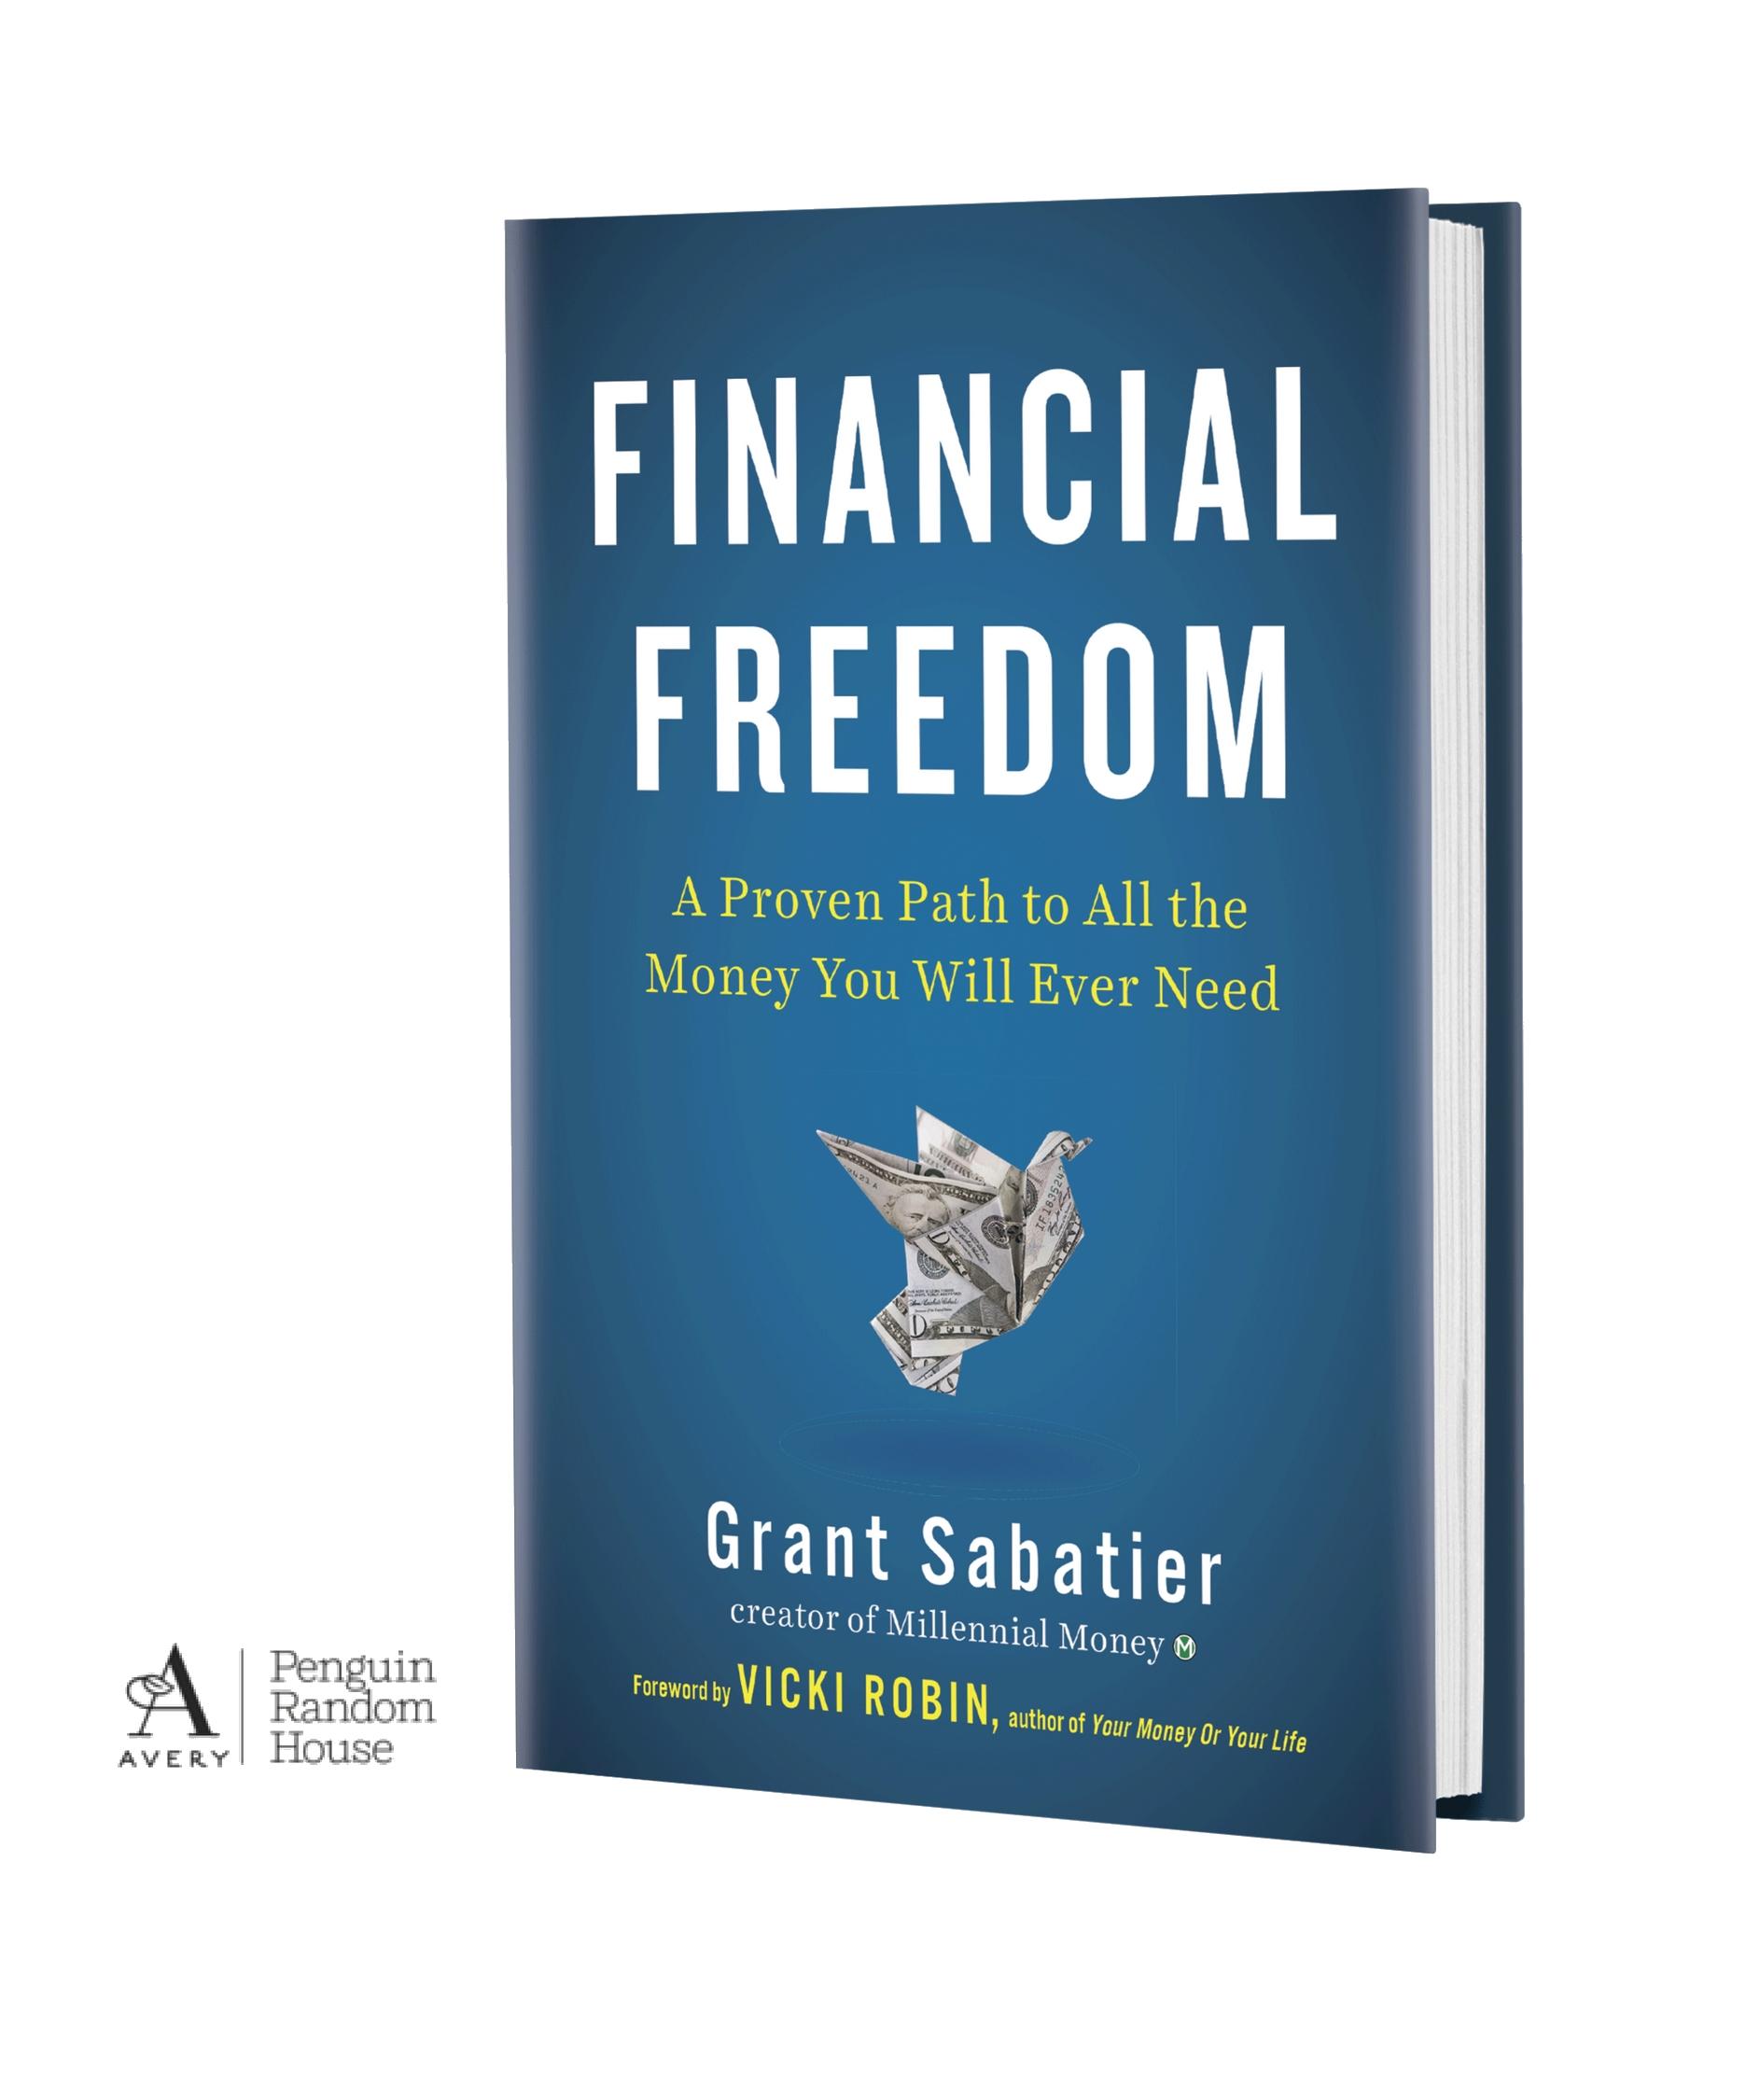 Financial Freedom Book Grant Sabatier